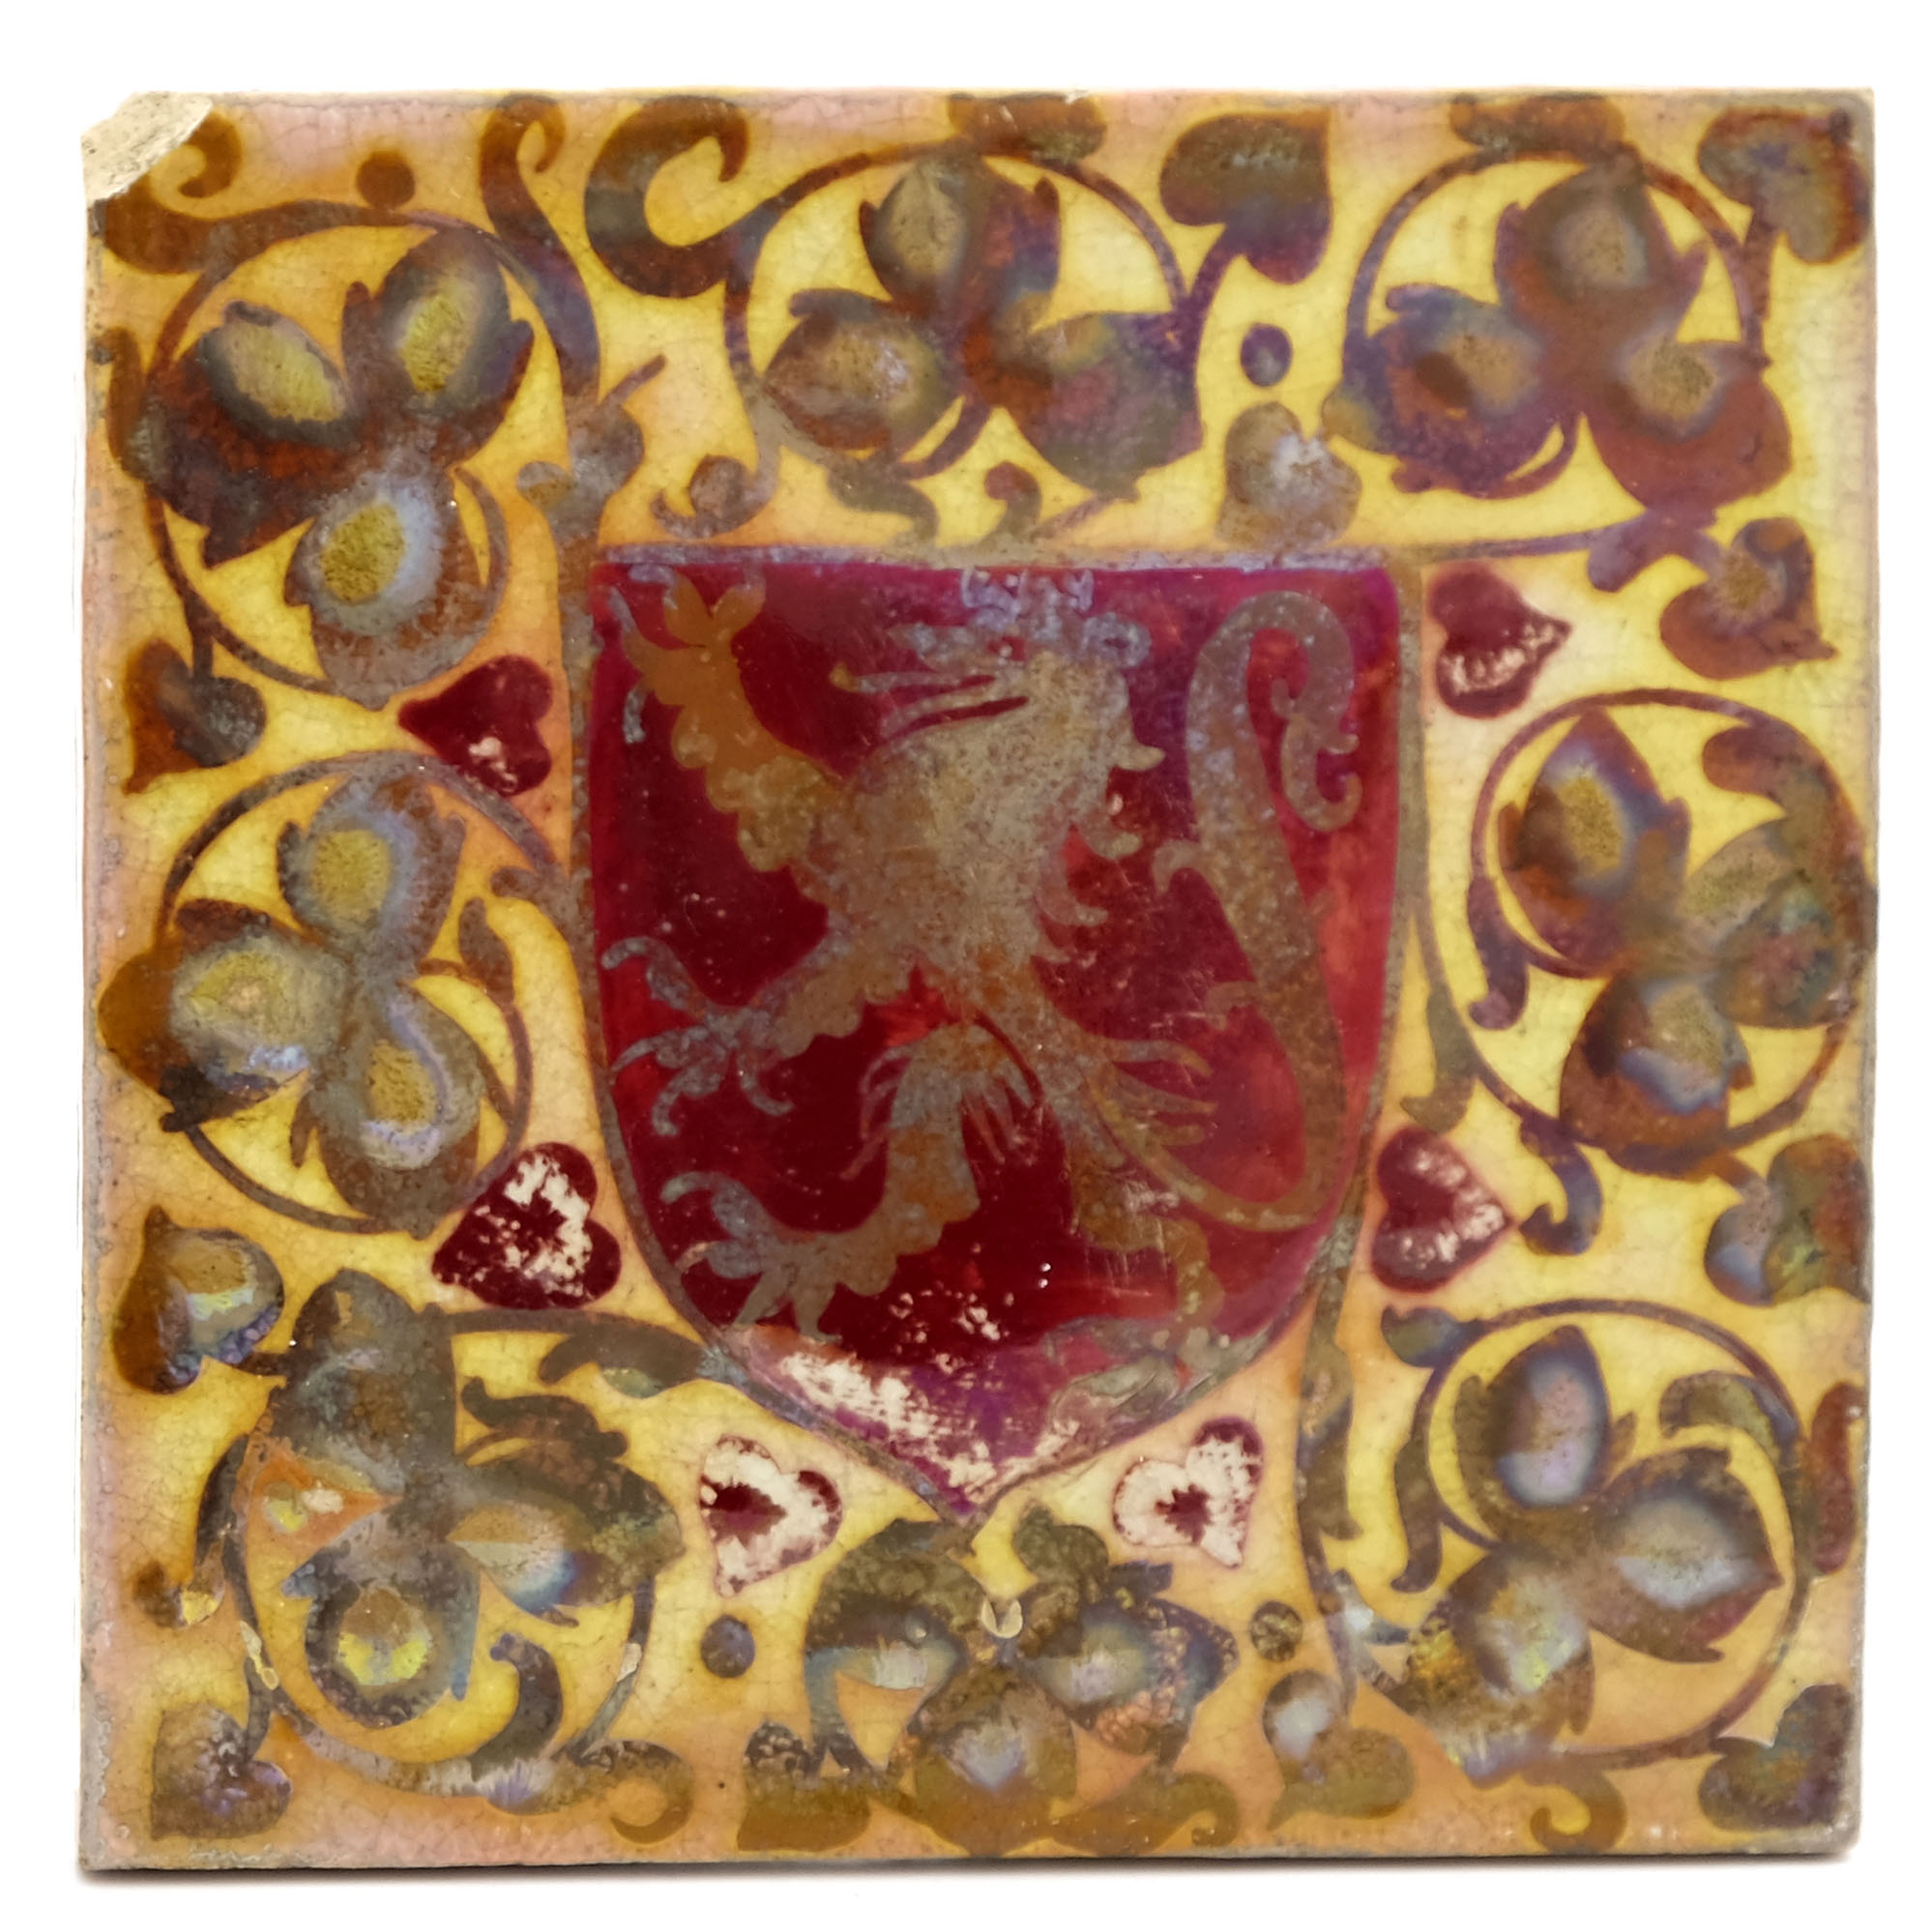 Pilkington, a Royal Lancastrian relief moulded her